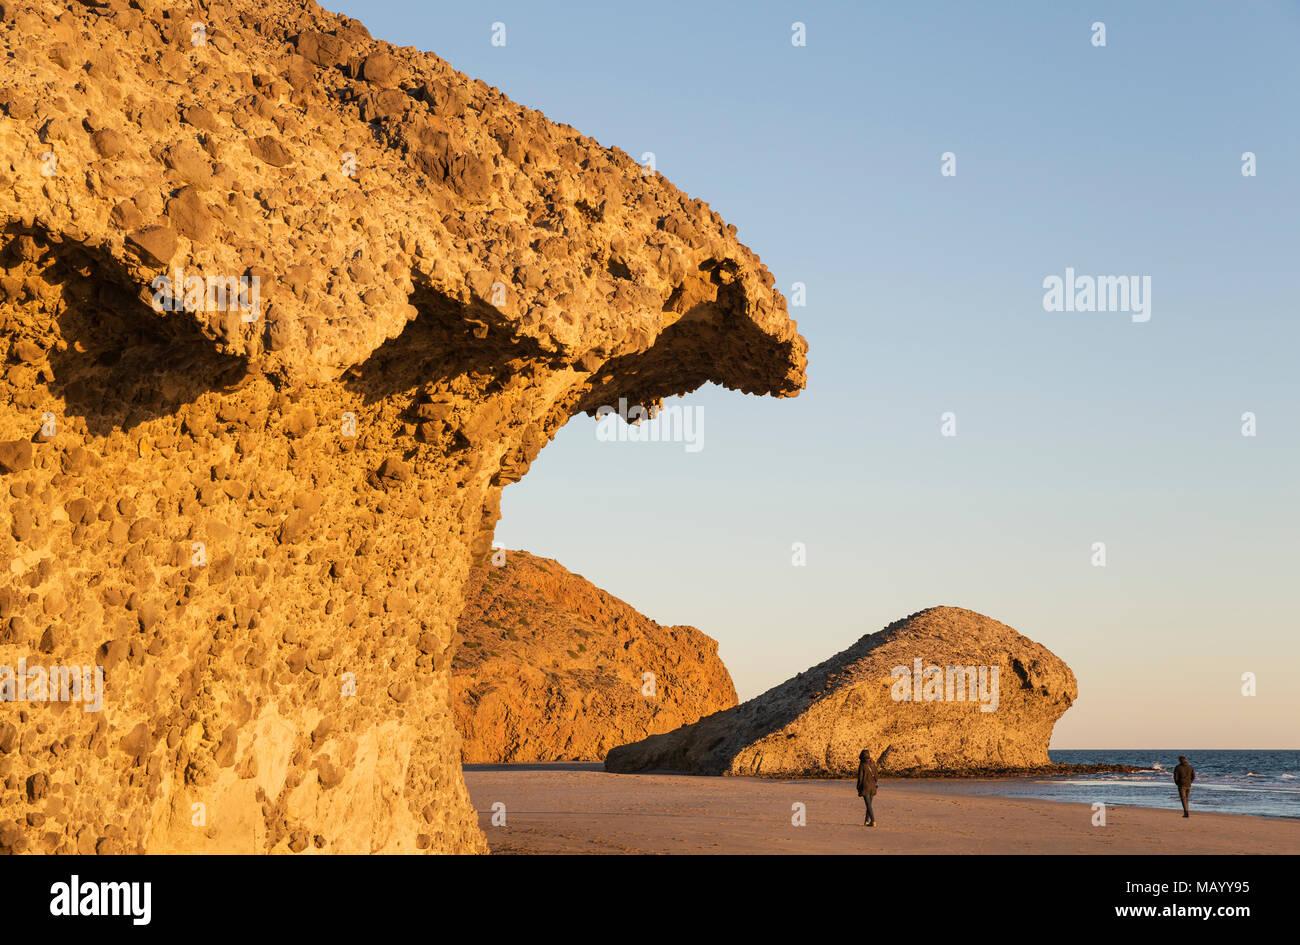 Fossilized lava tongues and walls at the beach Playa del Monsul, Nature Reserve Cabo de Gata-Nijar, Almeria province, Andalusia - Stock Image